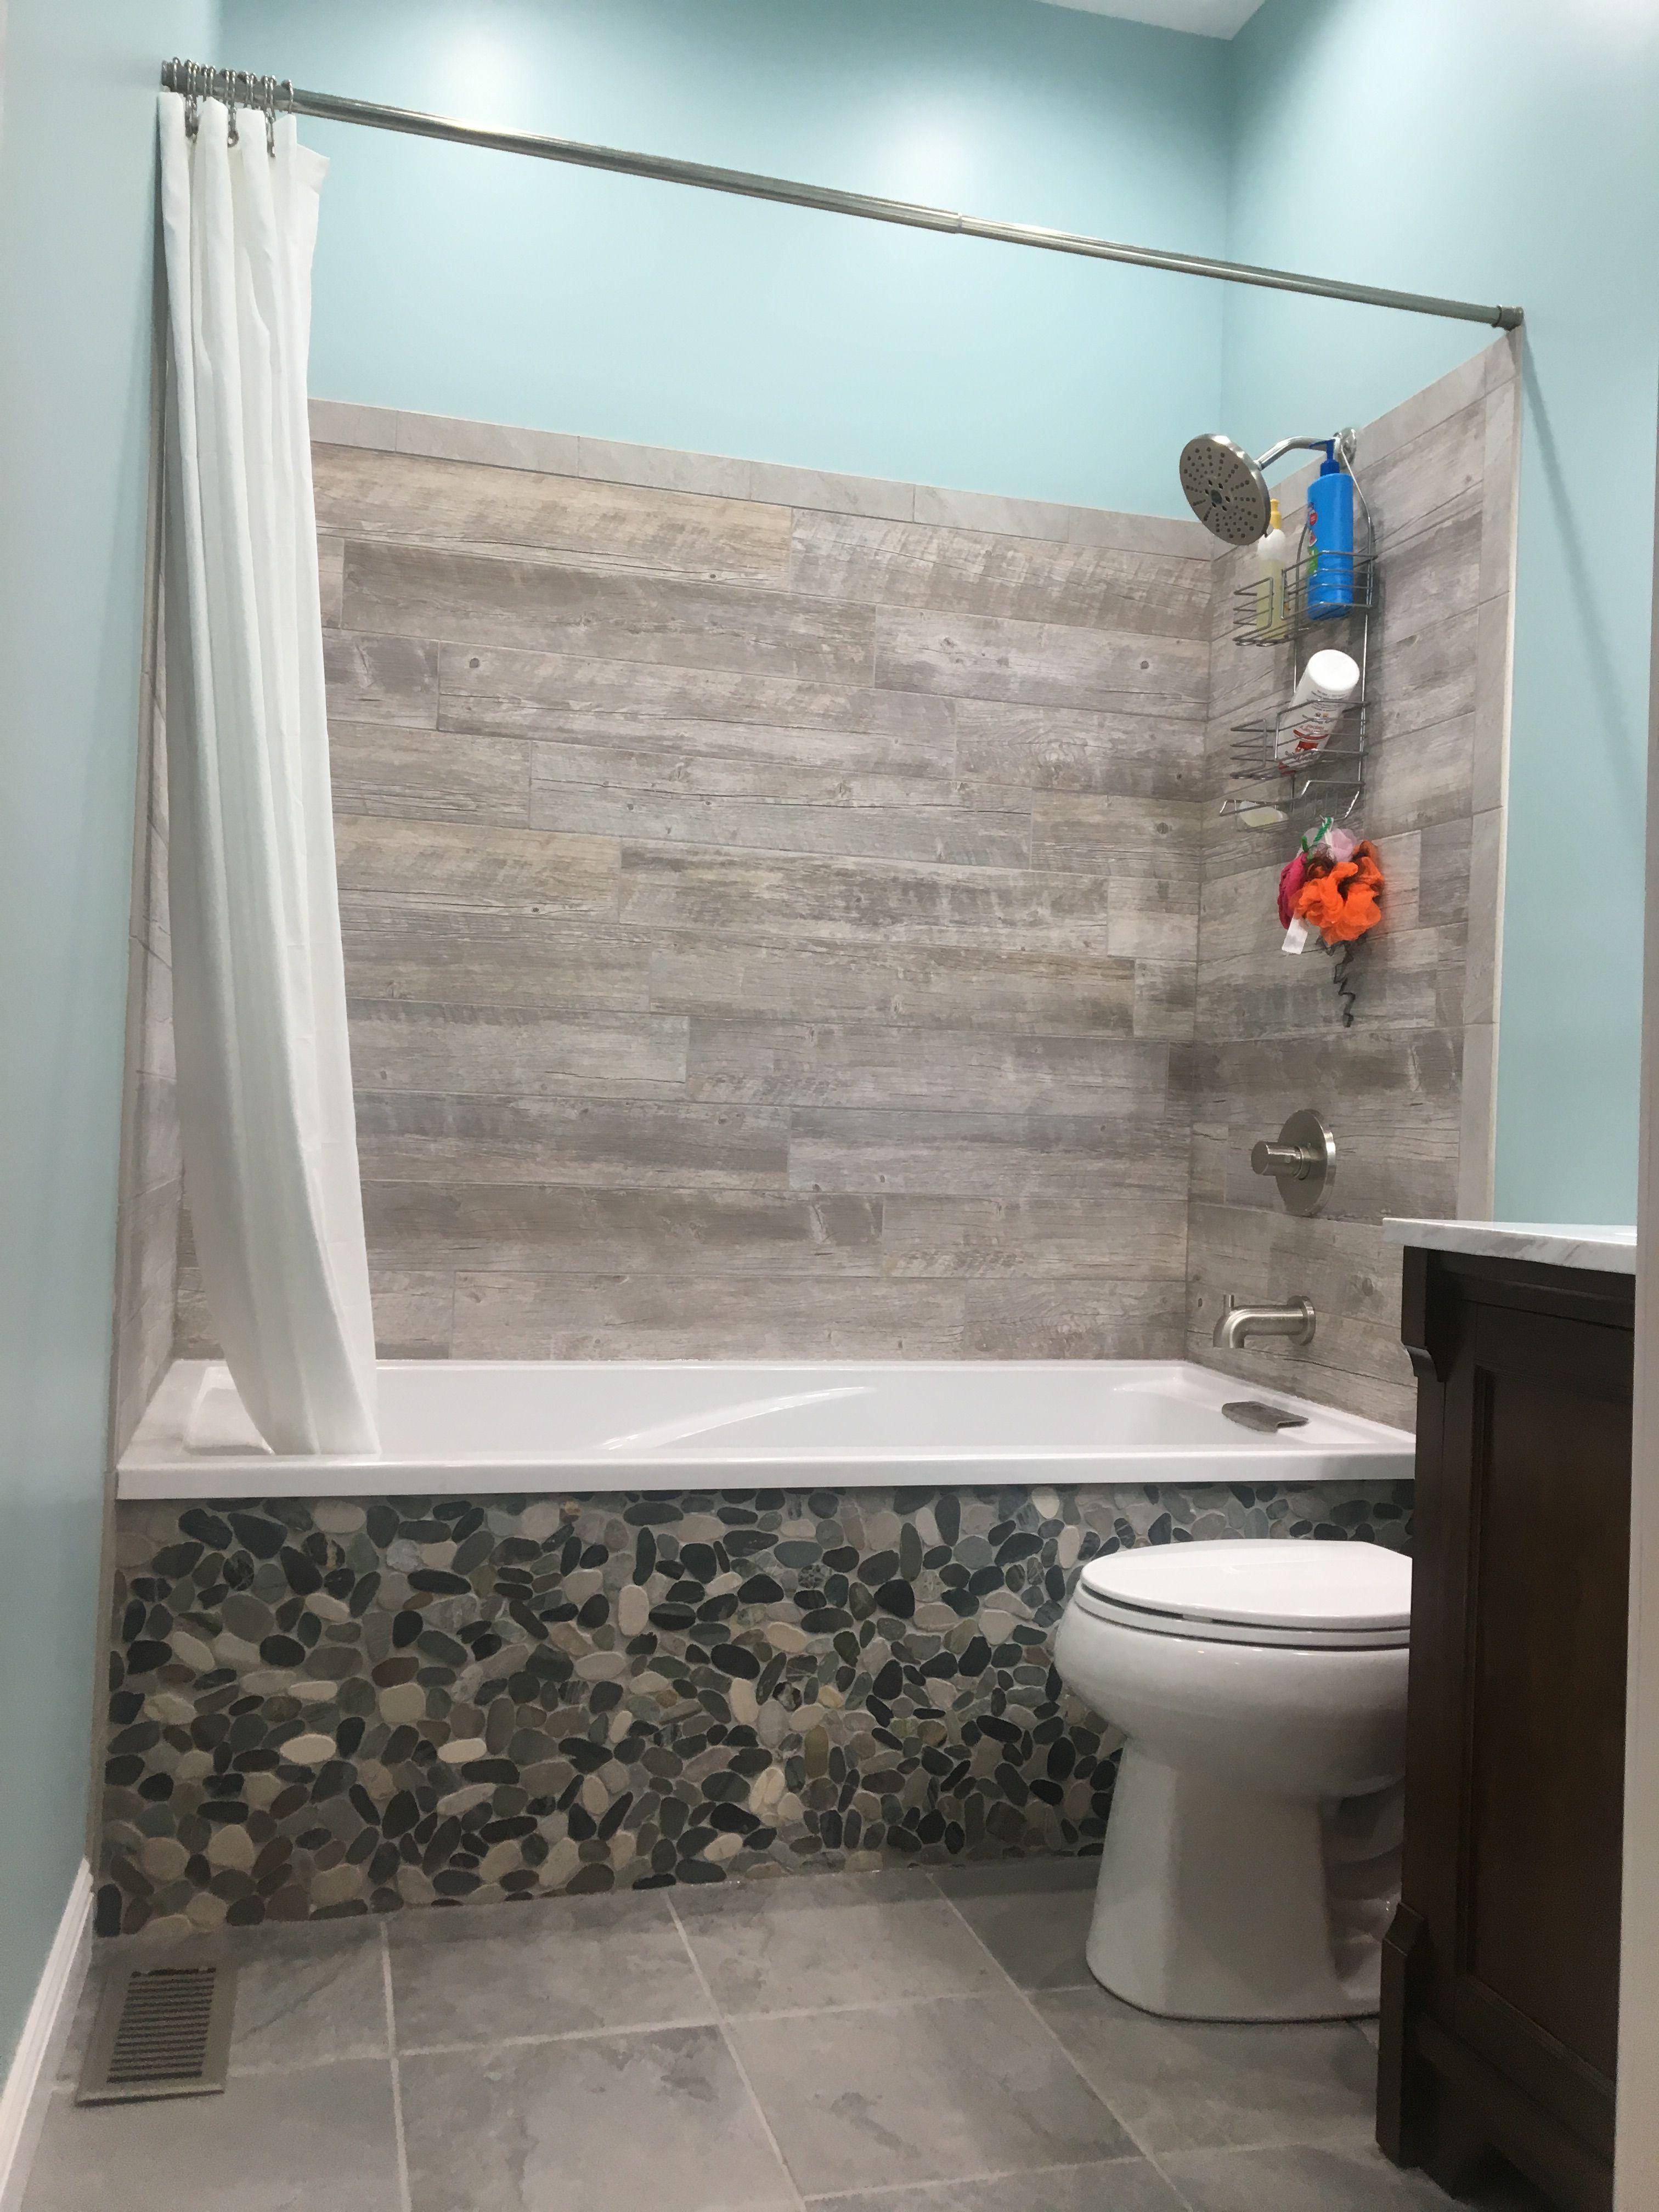 Bathroom Remodel Wood Tile River Rock Tub Front With Images